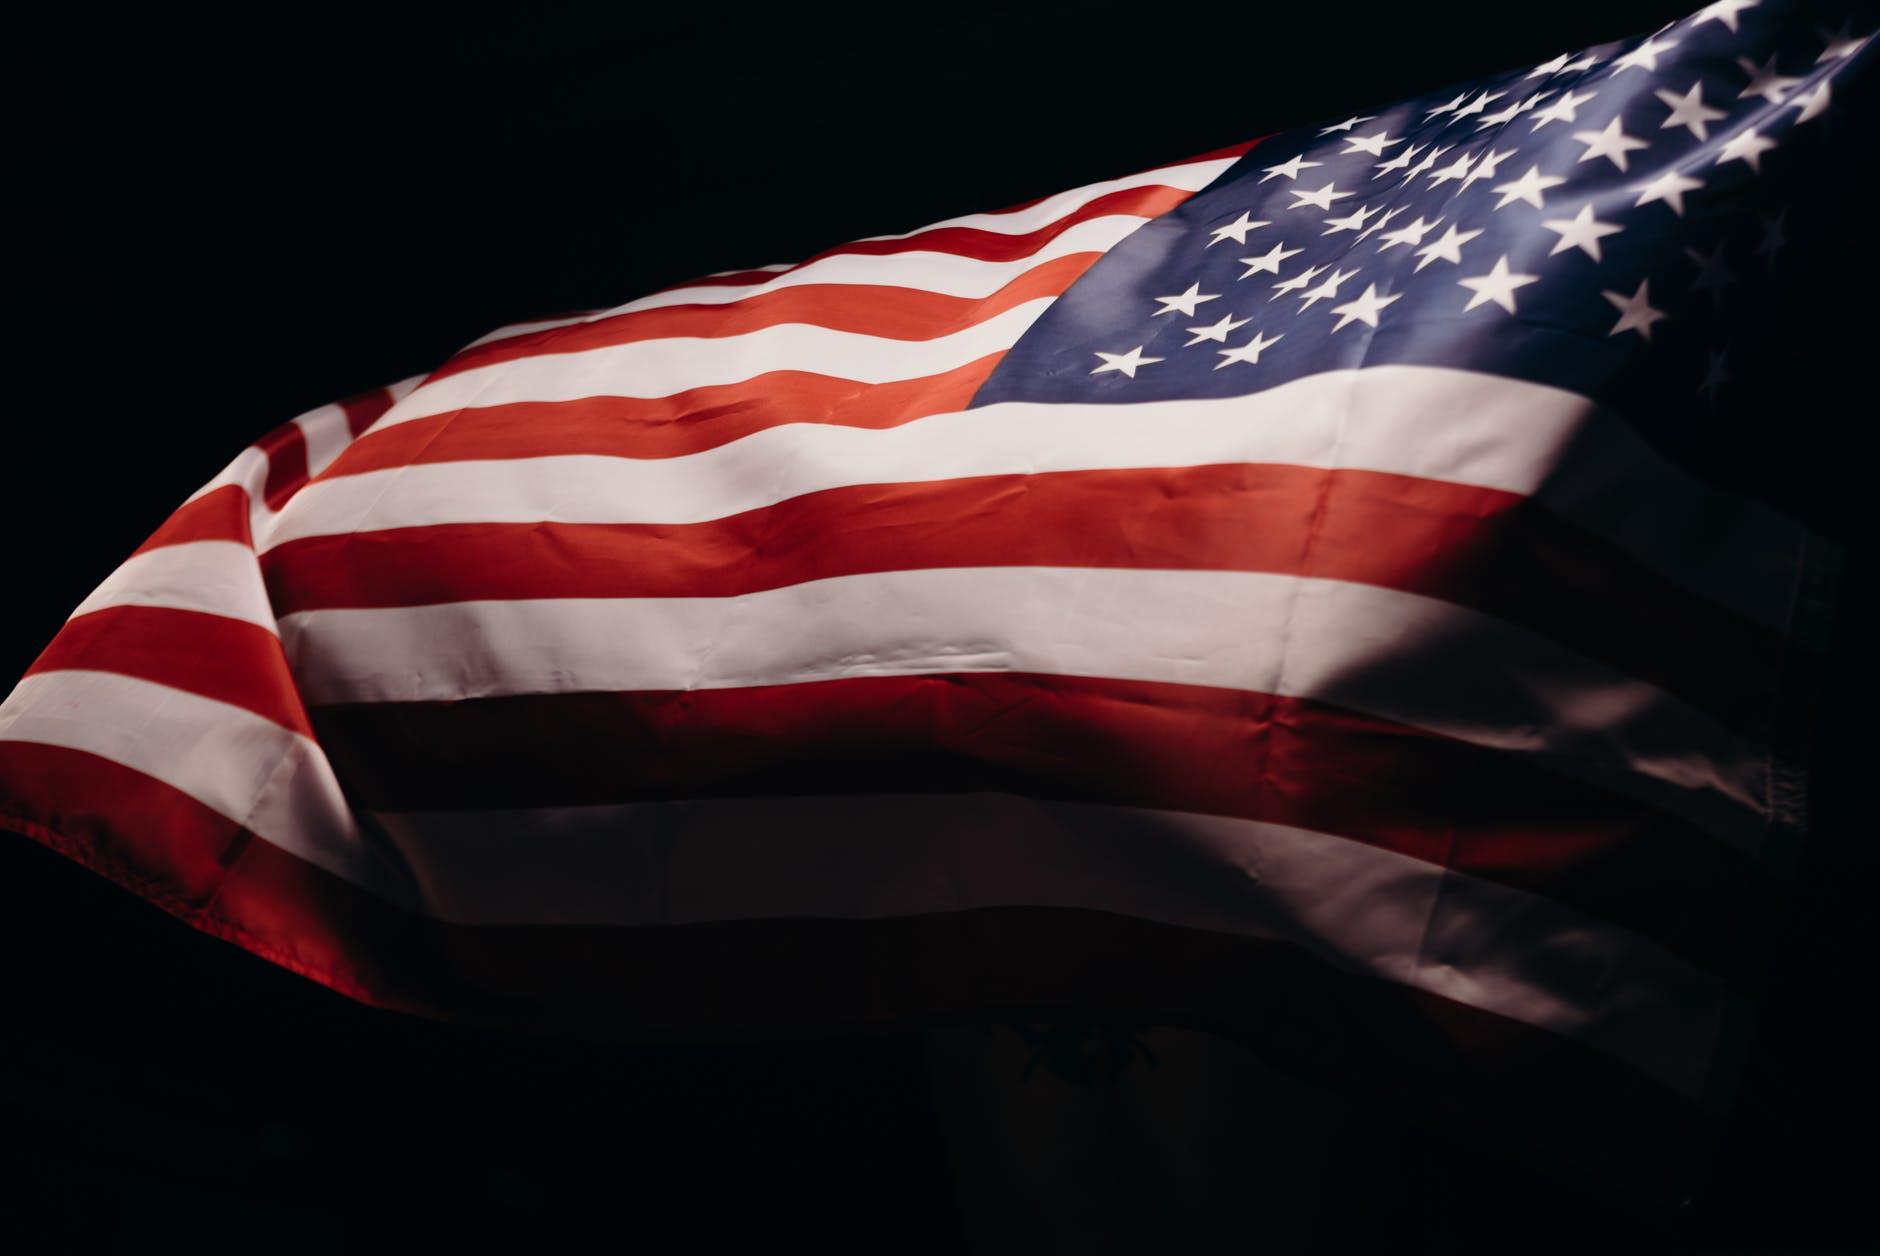 U.S.A. flag flying free